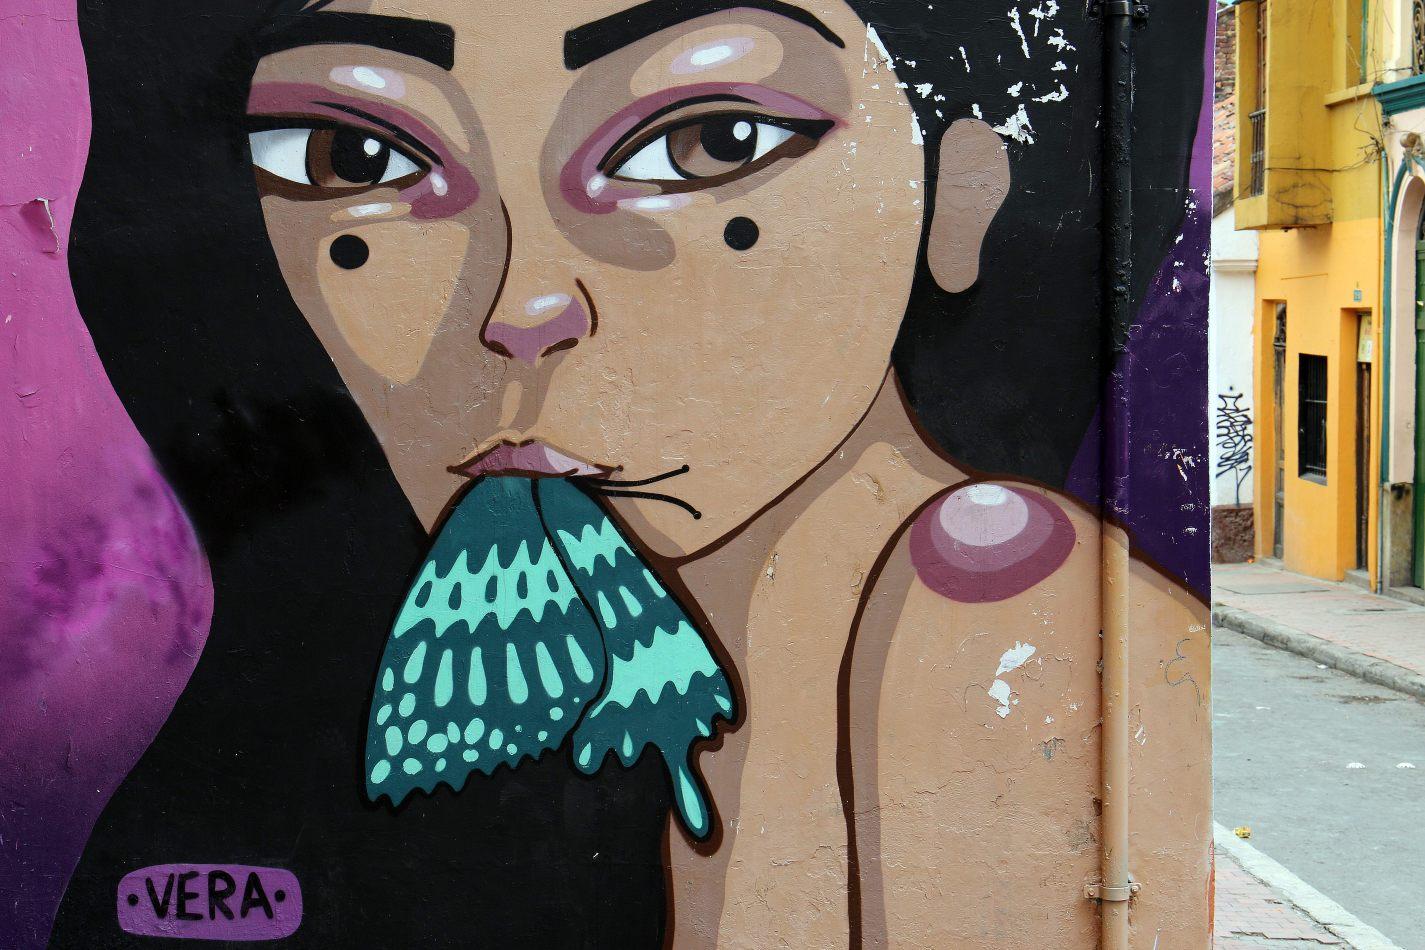 Anthony Ellis Photography: Antes del Refer� ndum - Vera Sucks a Butterfly